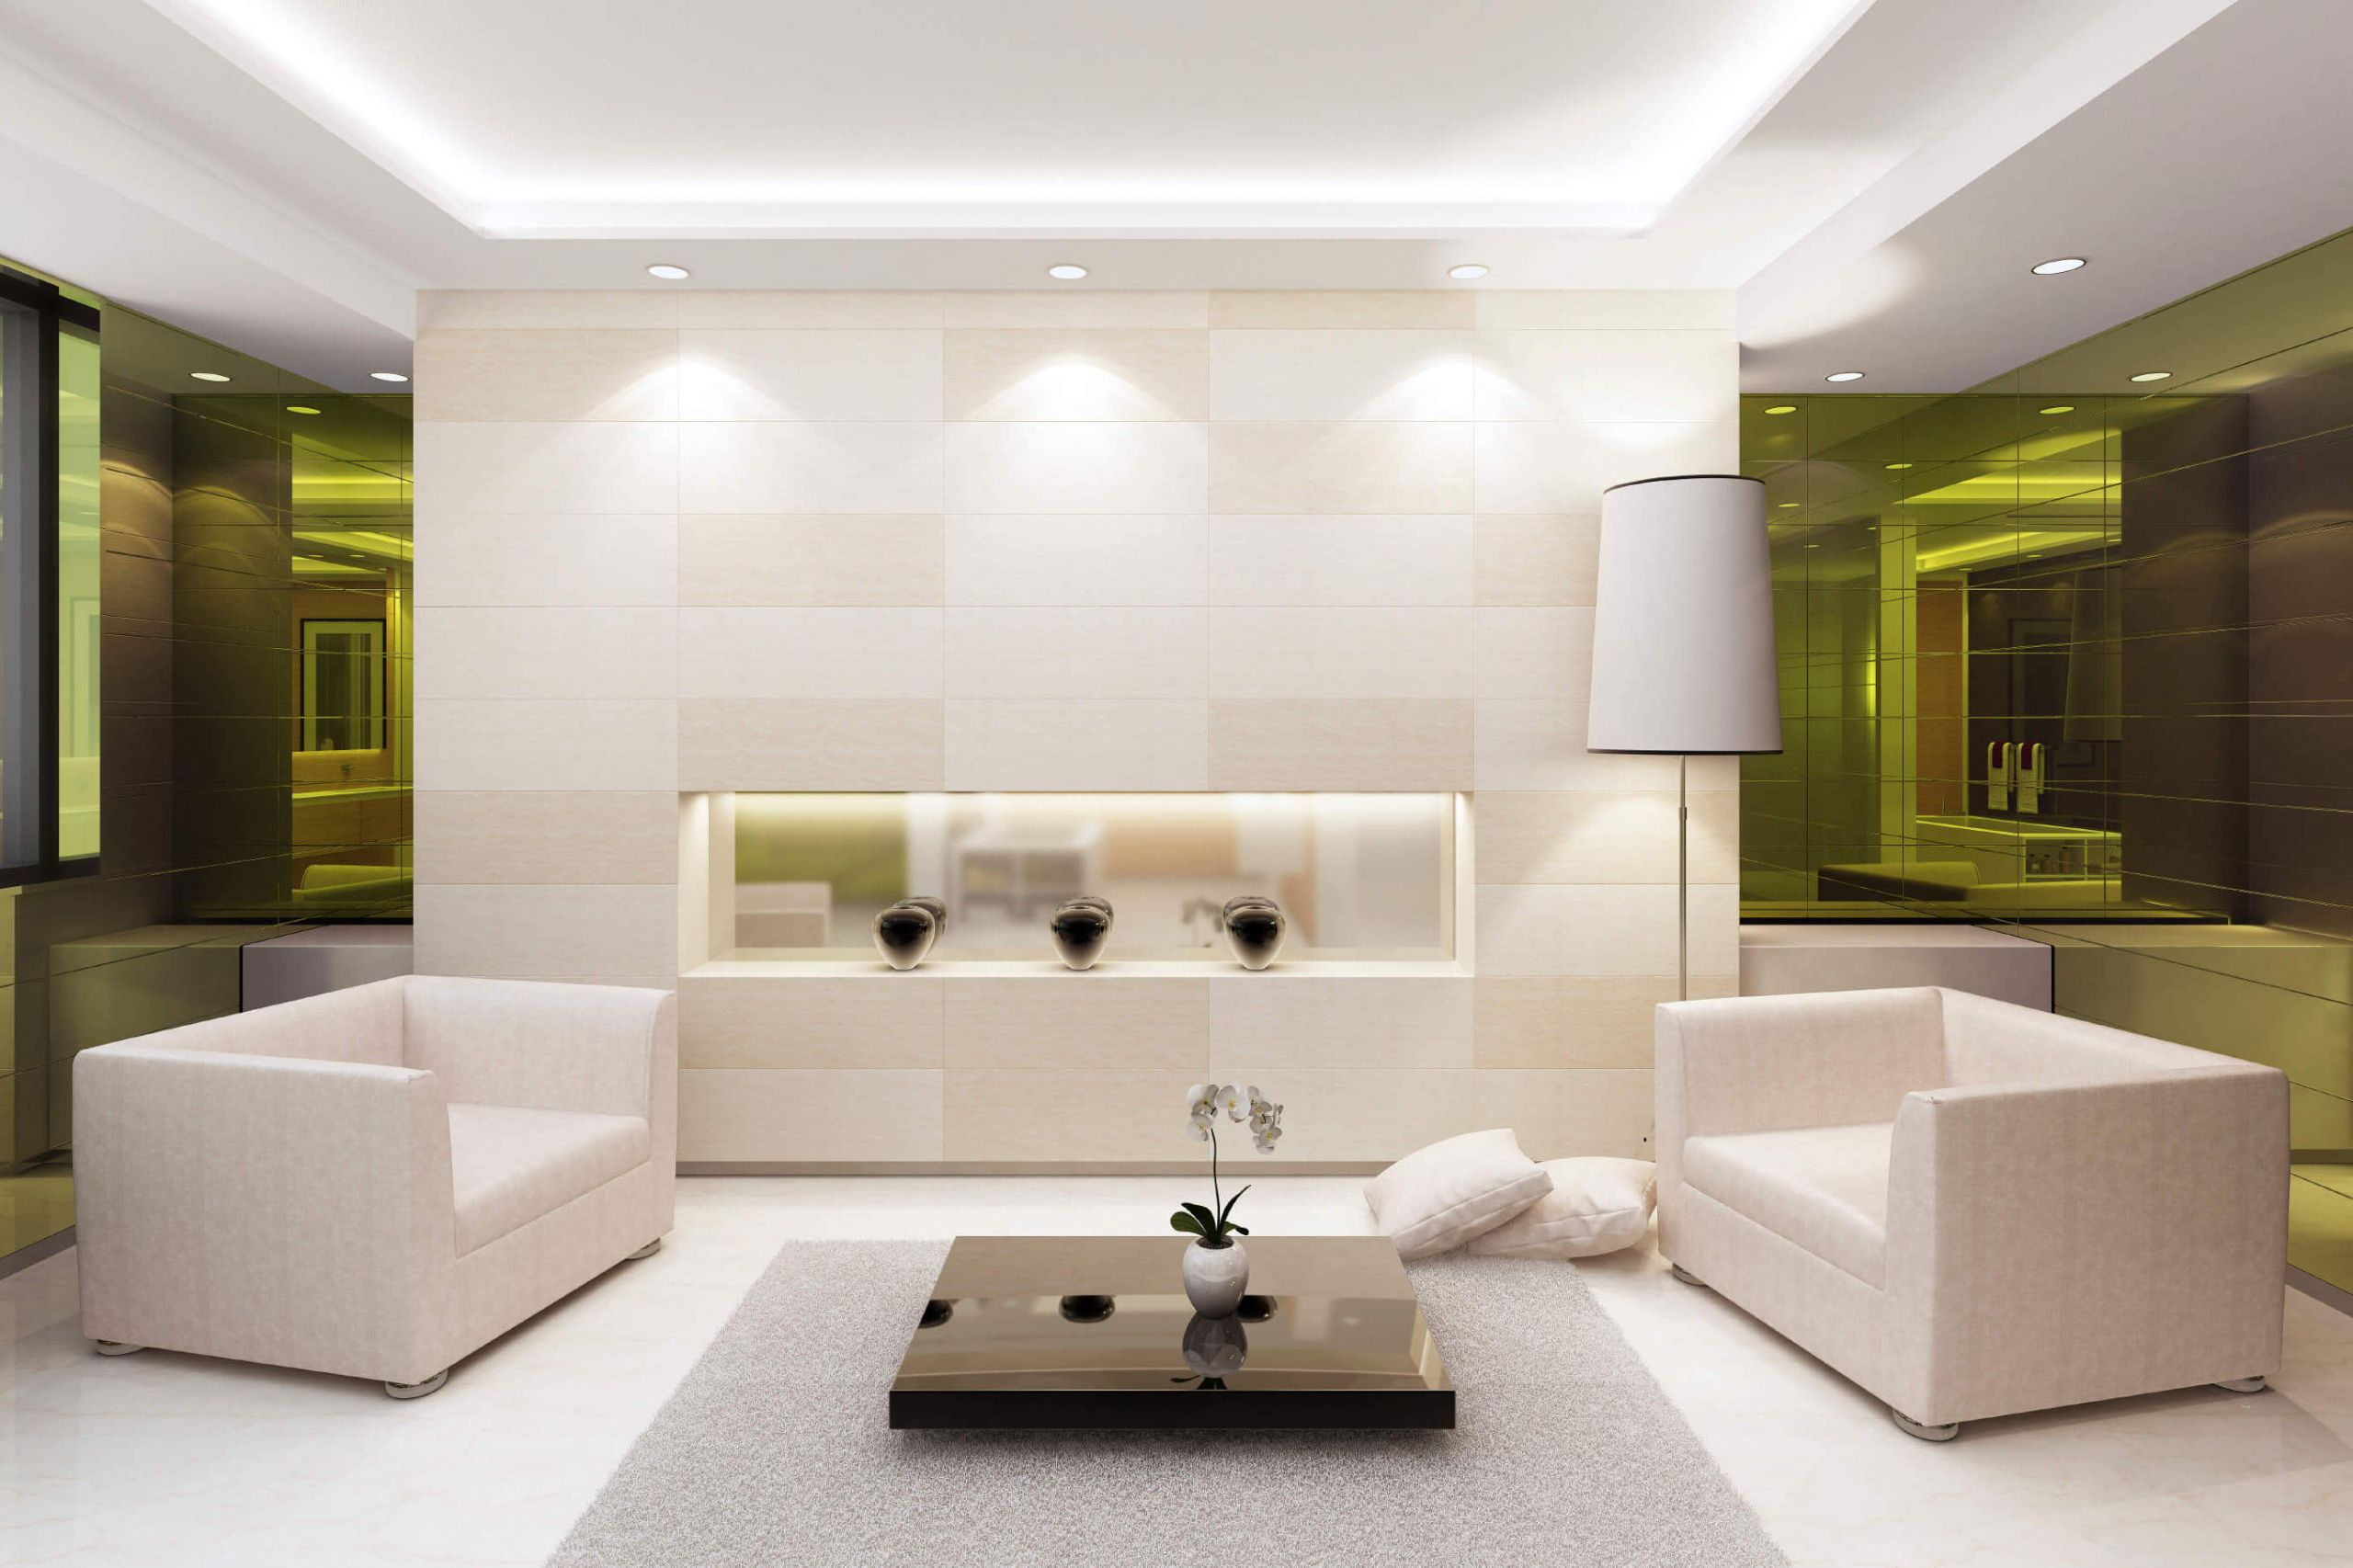 Living Room Spotlights  Living Room Lighting Ideas on a Bud